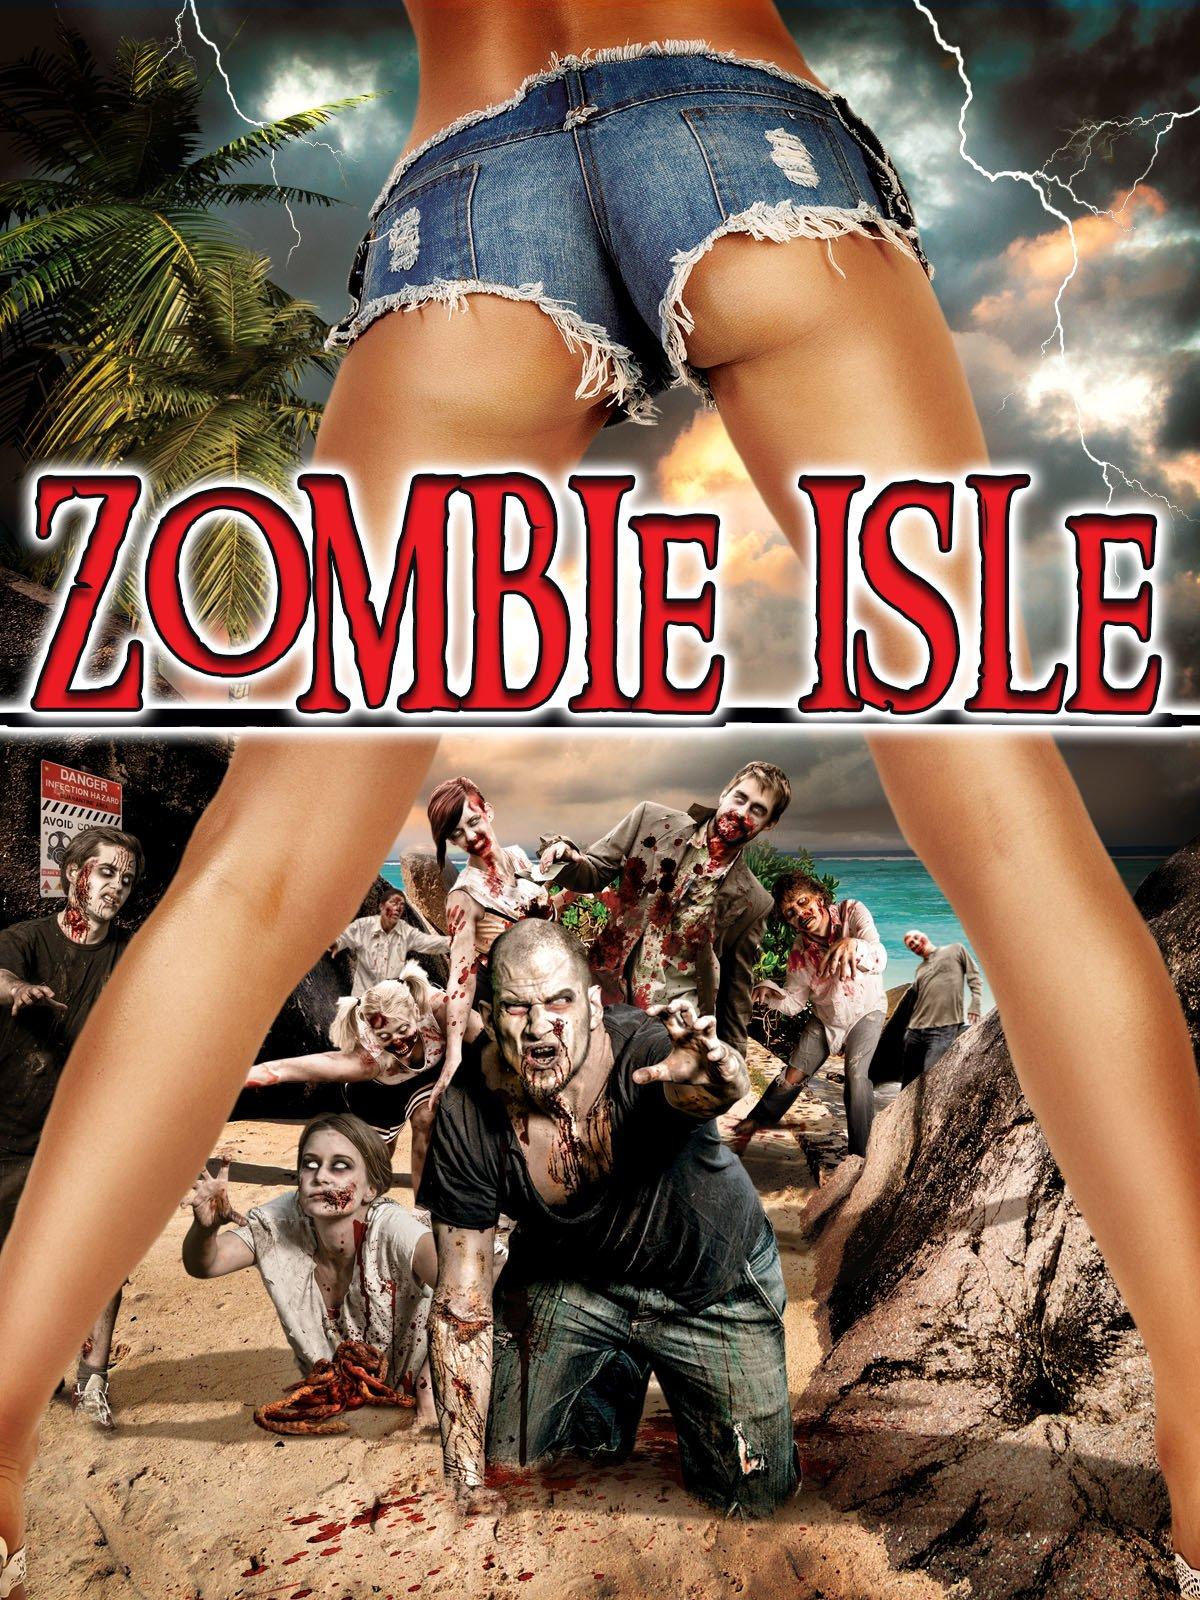 A Zombie Isle